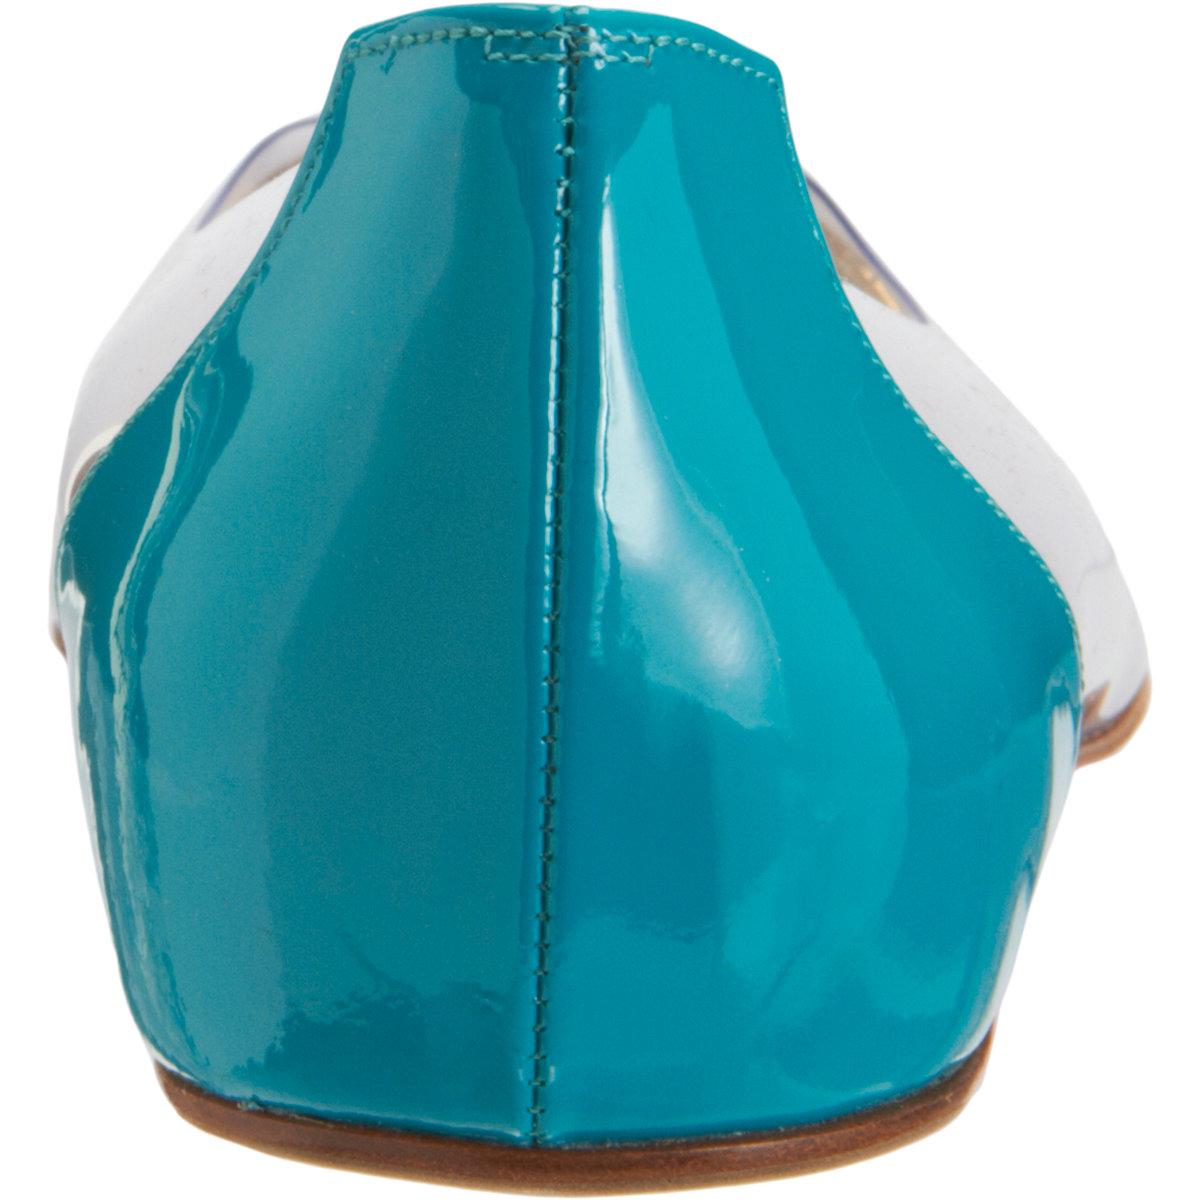 best replica sneaker site - christian-louboutin-corbeau-flat-product-4-7782256-620292471.jpeg